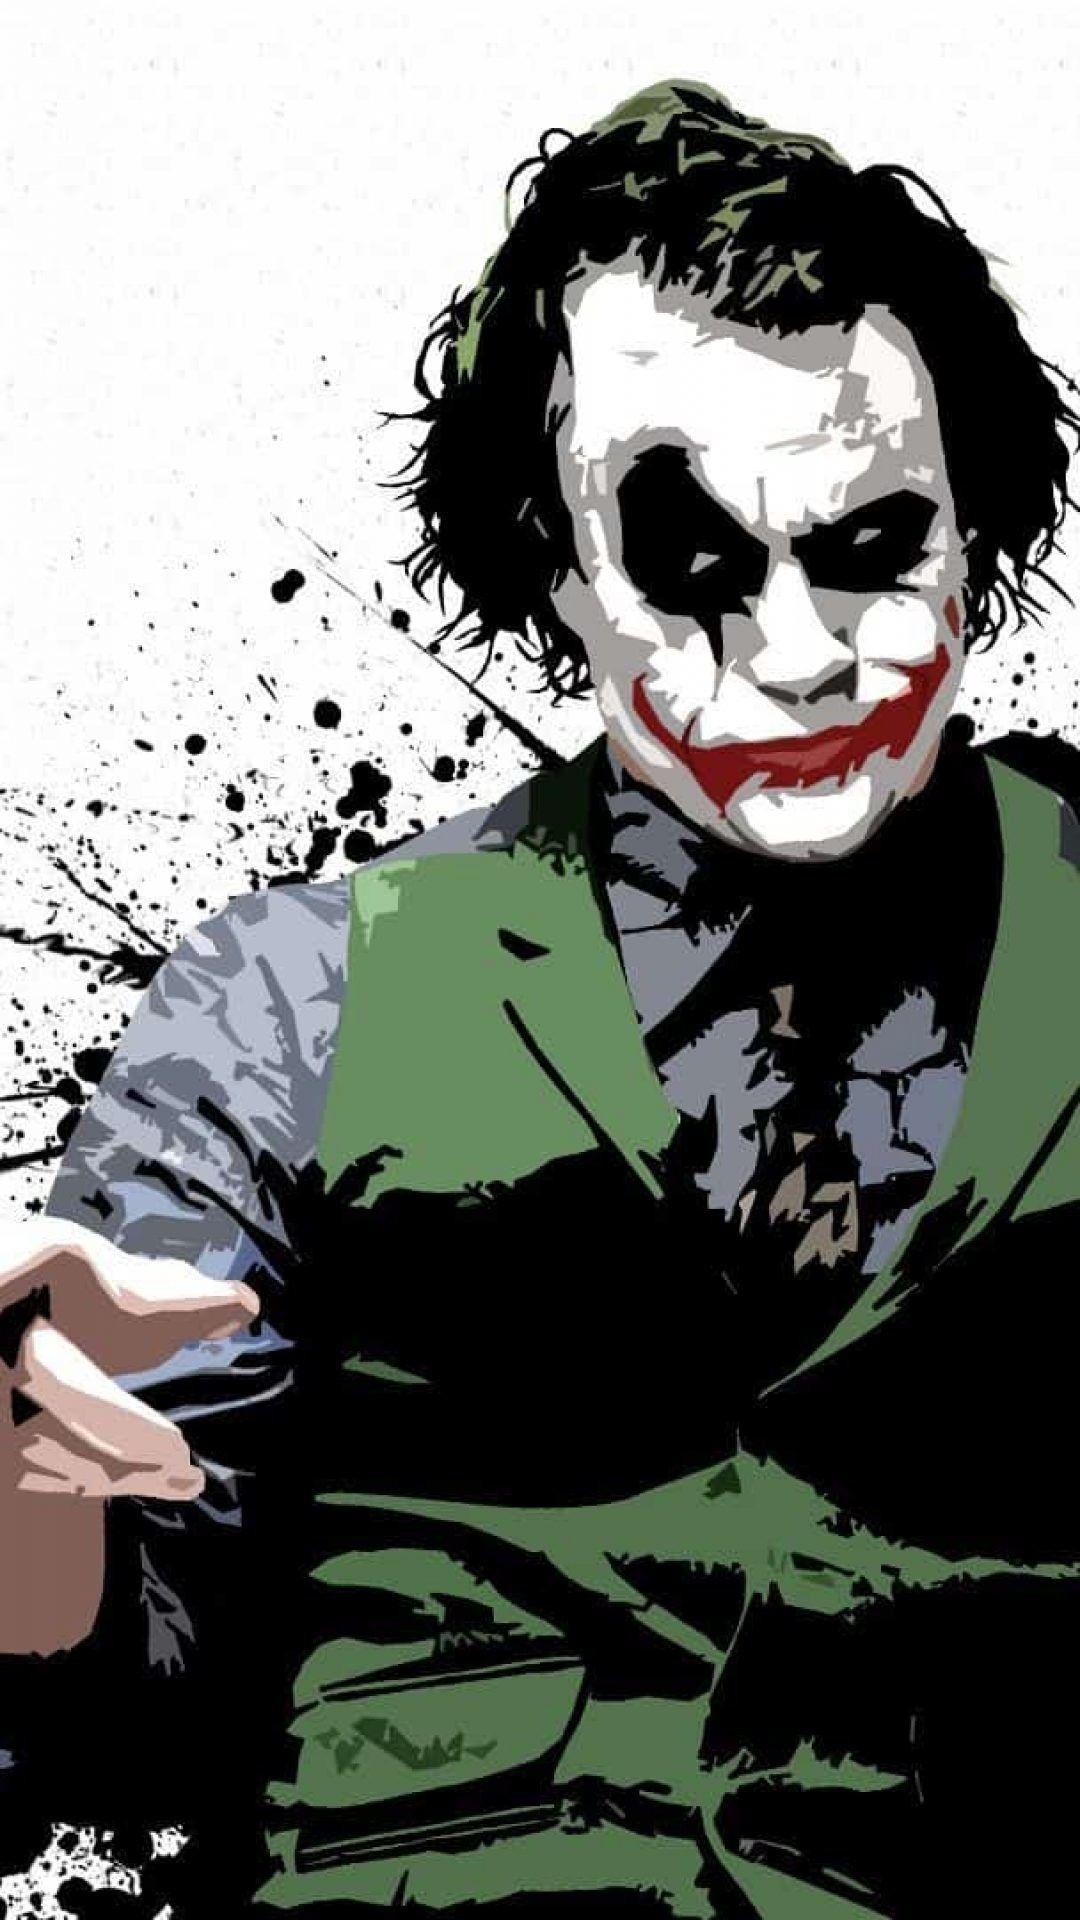 Joker Why So Serious Wallpaper Home Screen Batman Joker Wallpaper Joker Wallpapers Joker Artwork